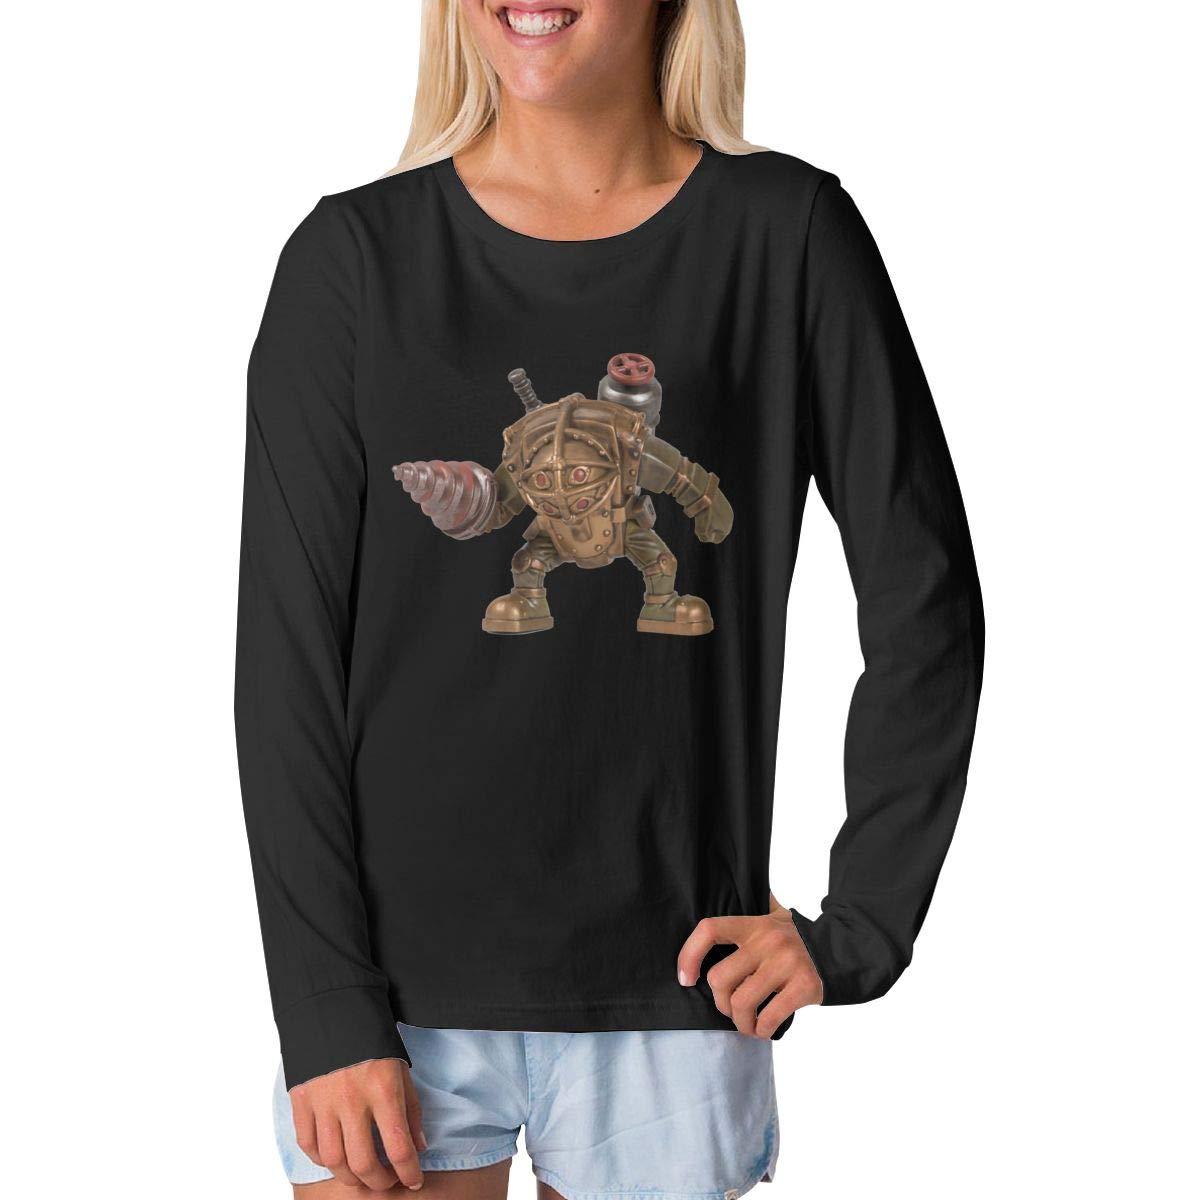 BilliePhillips Teenager Bioshock Fashion Long Sleeve Tshirts